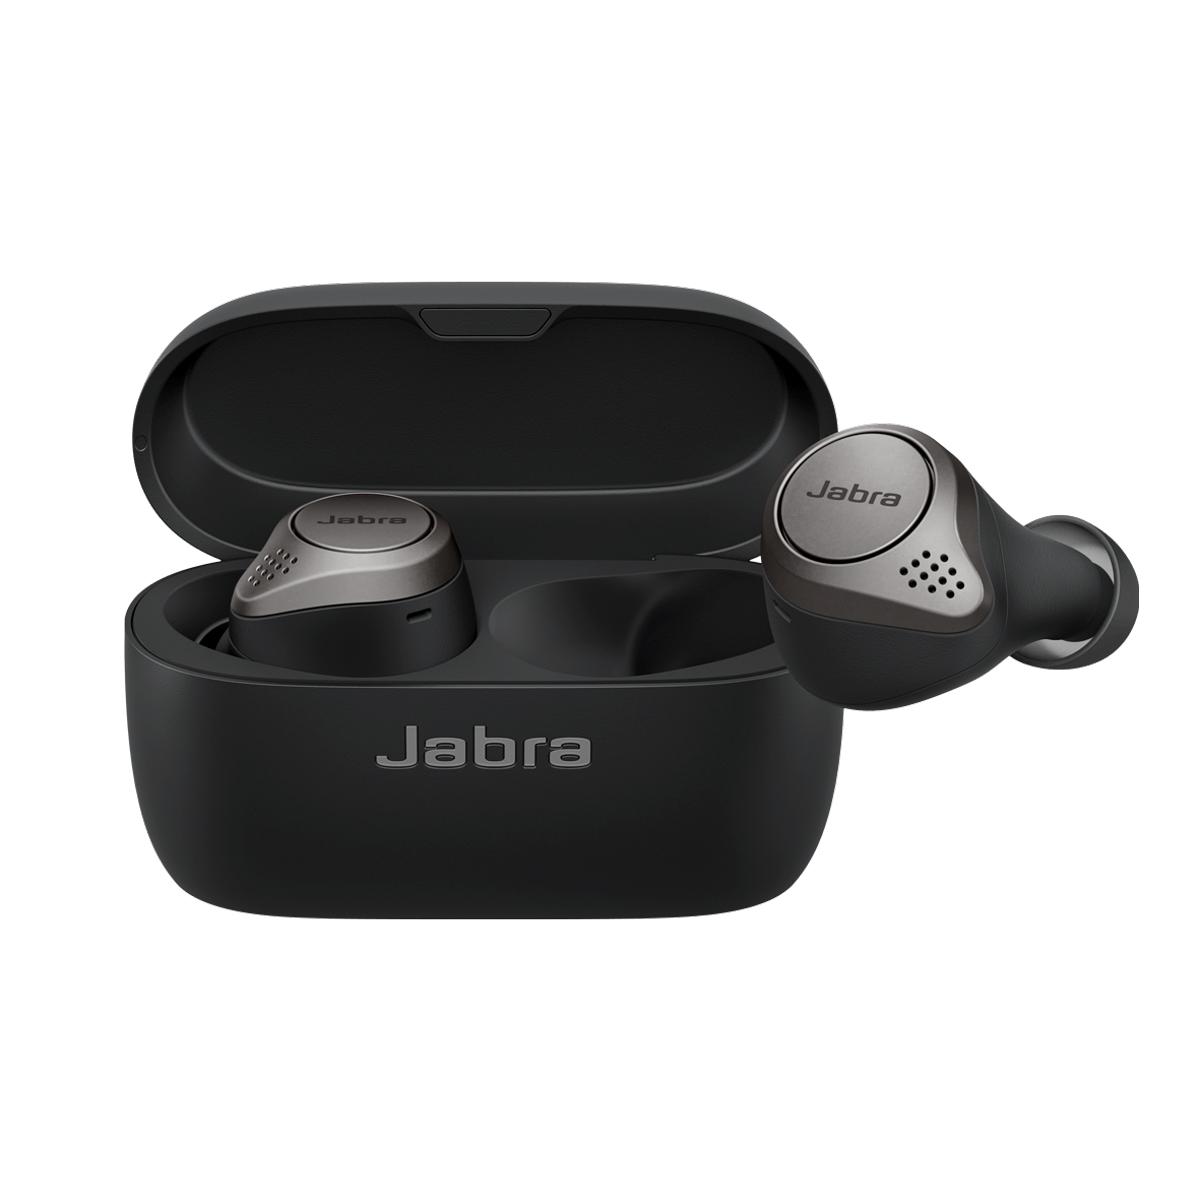 jabra-elite-active-75t